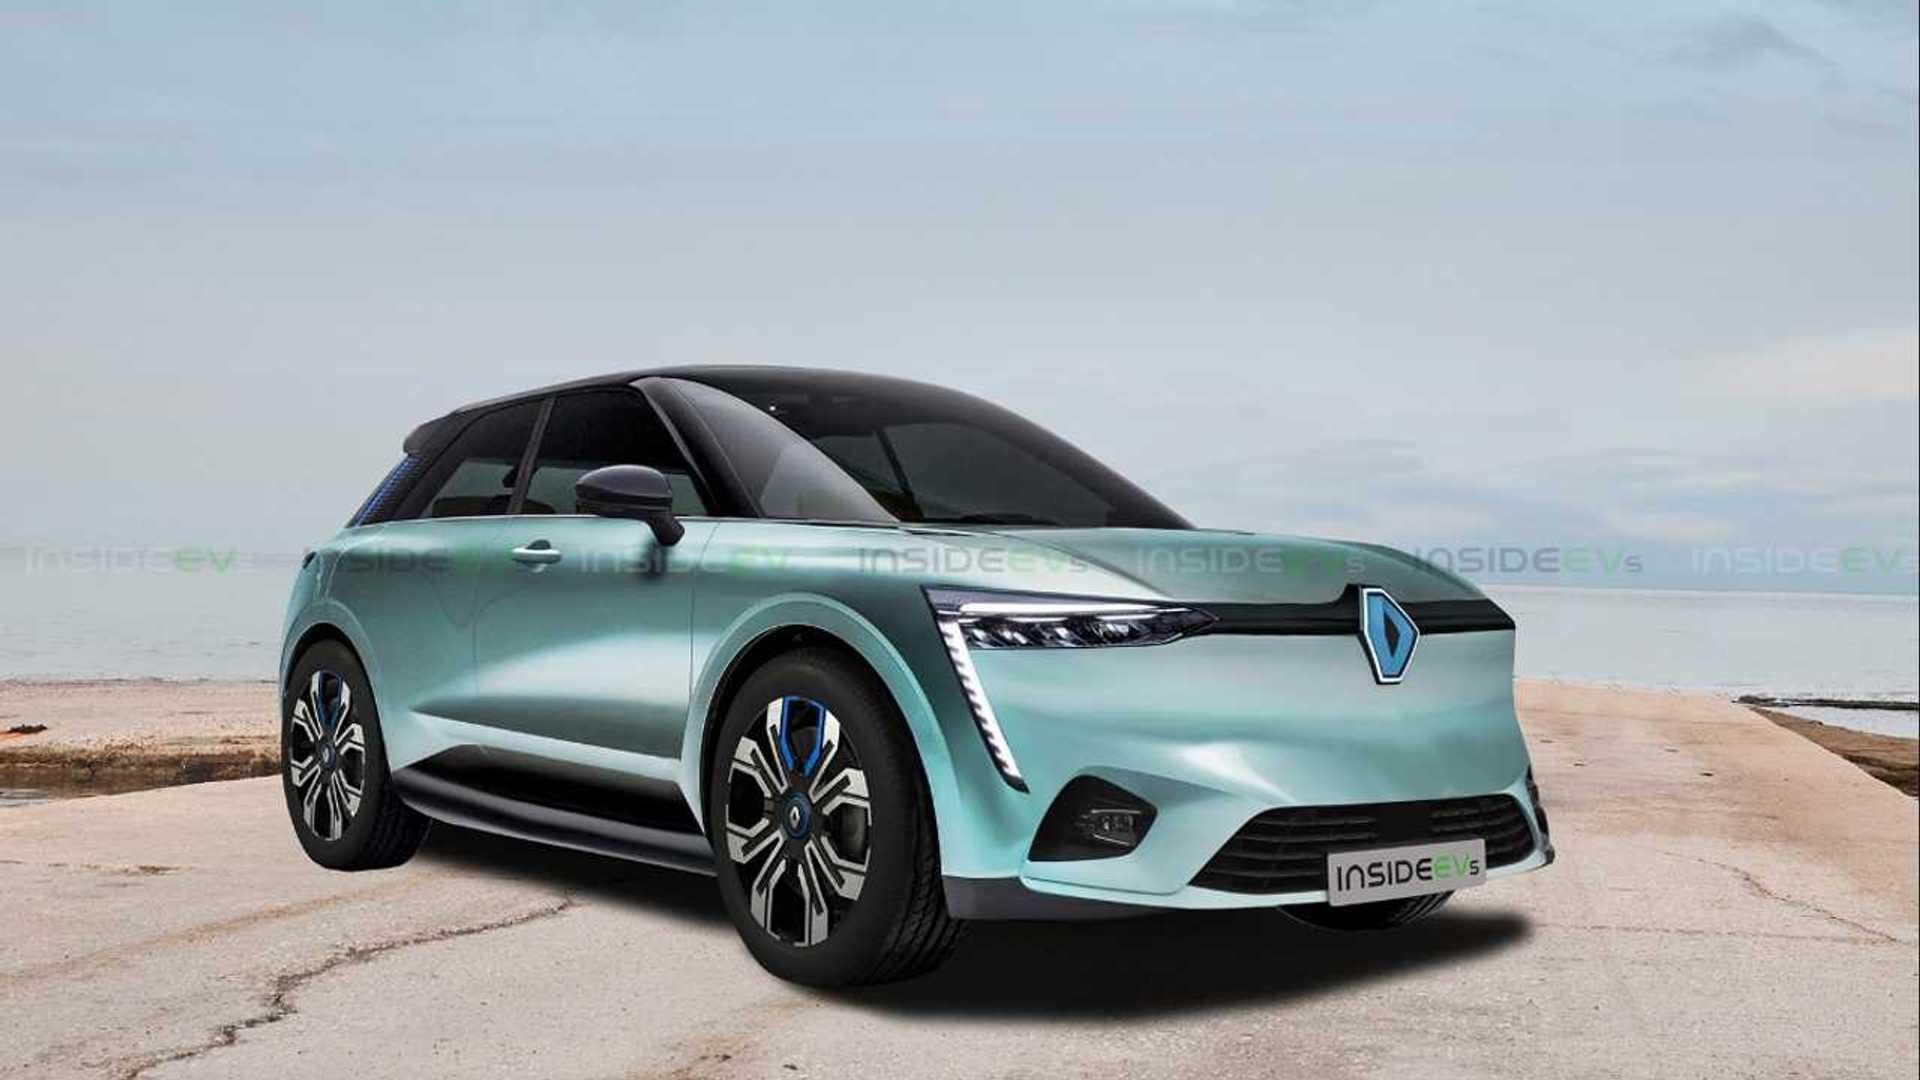 2021 - [Renault] SUV EV [BCB] Renault-electric-crossover-rendering-v2